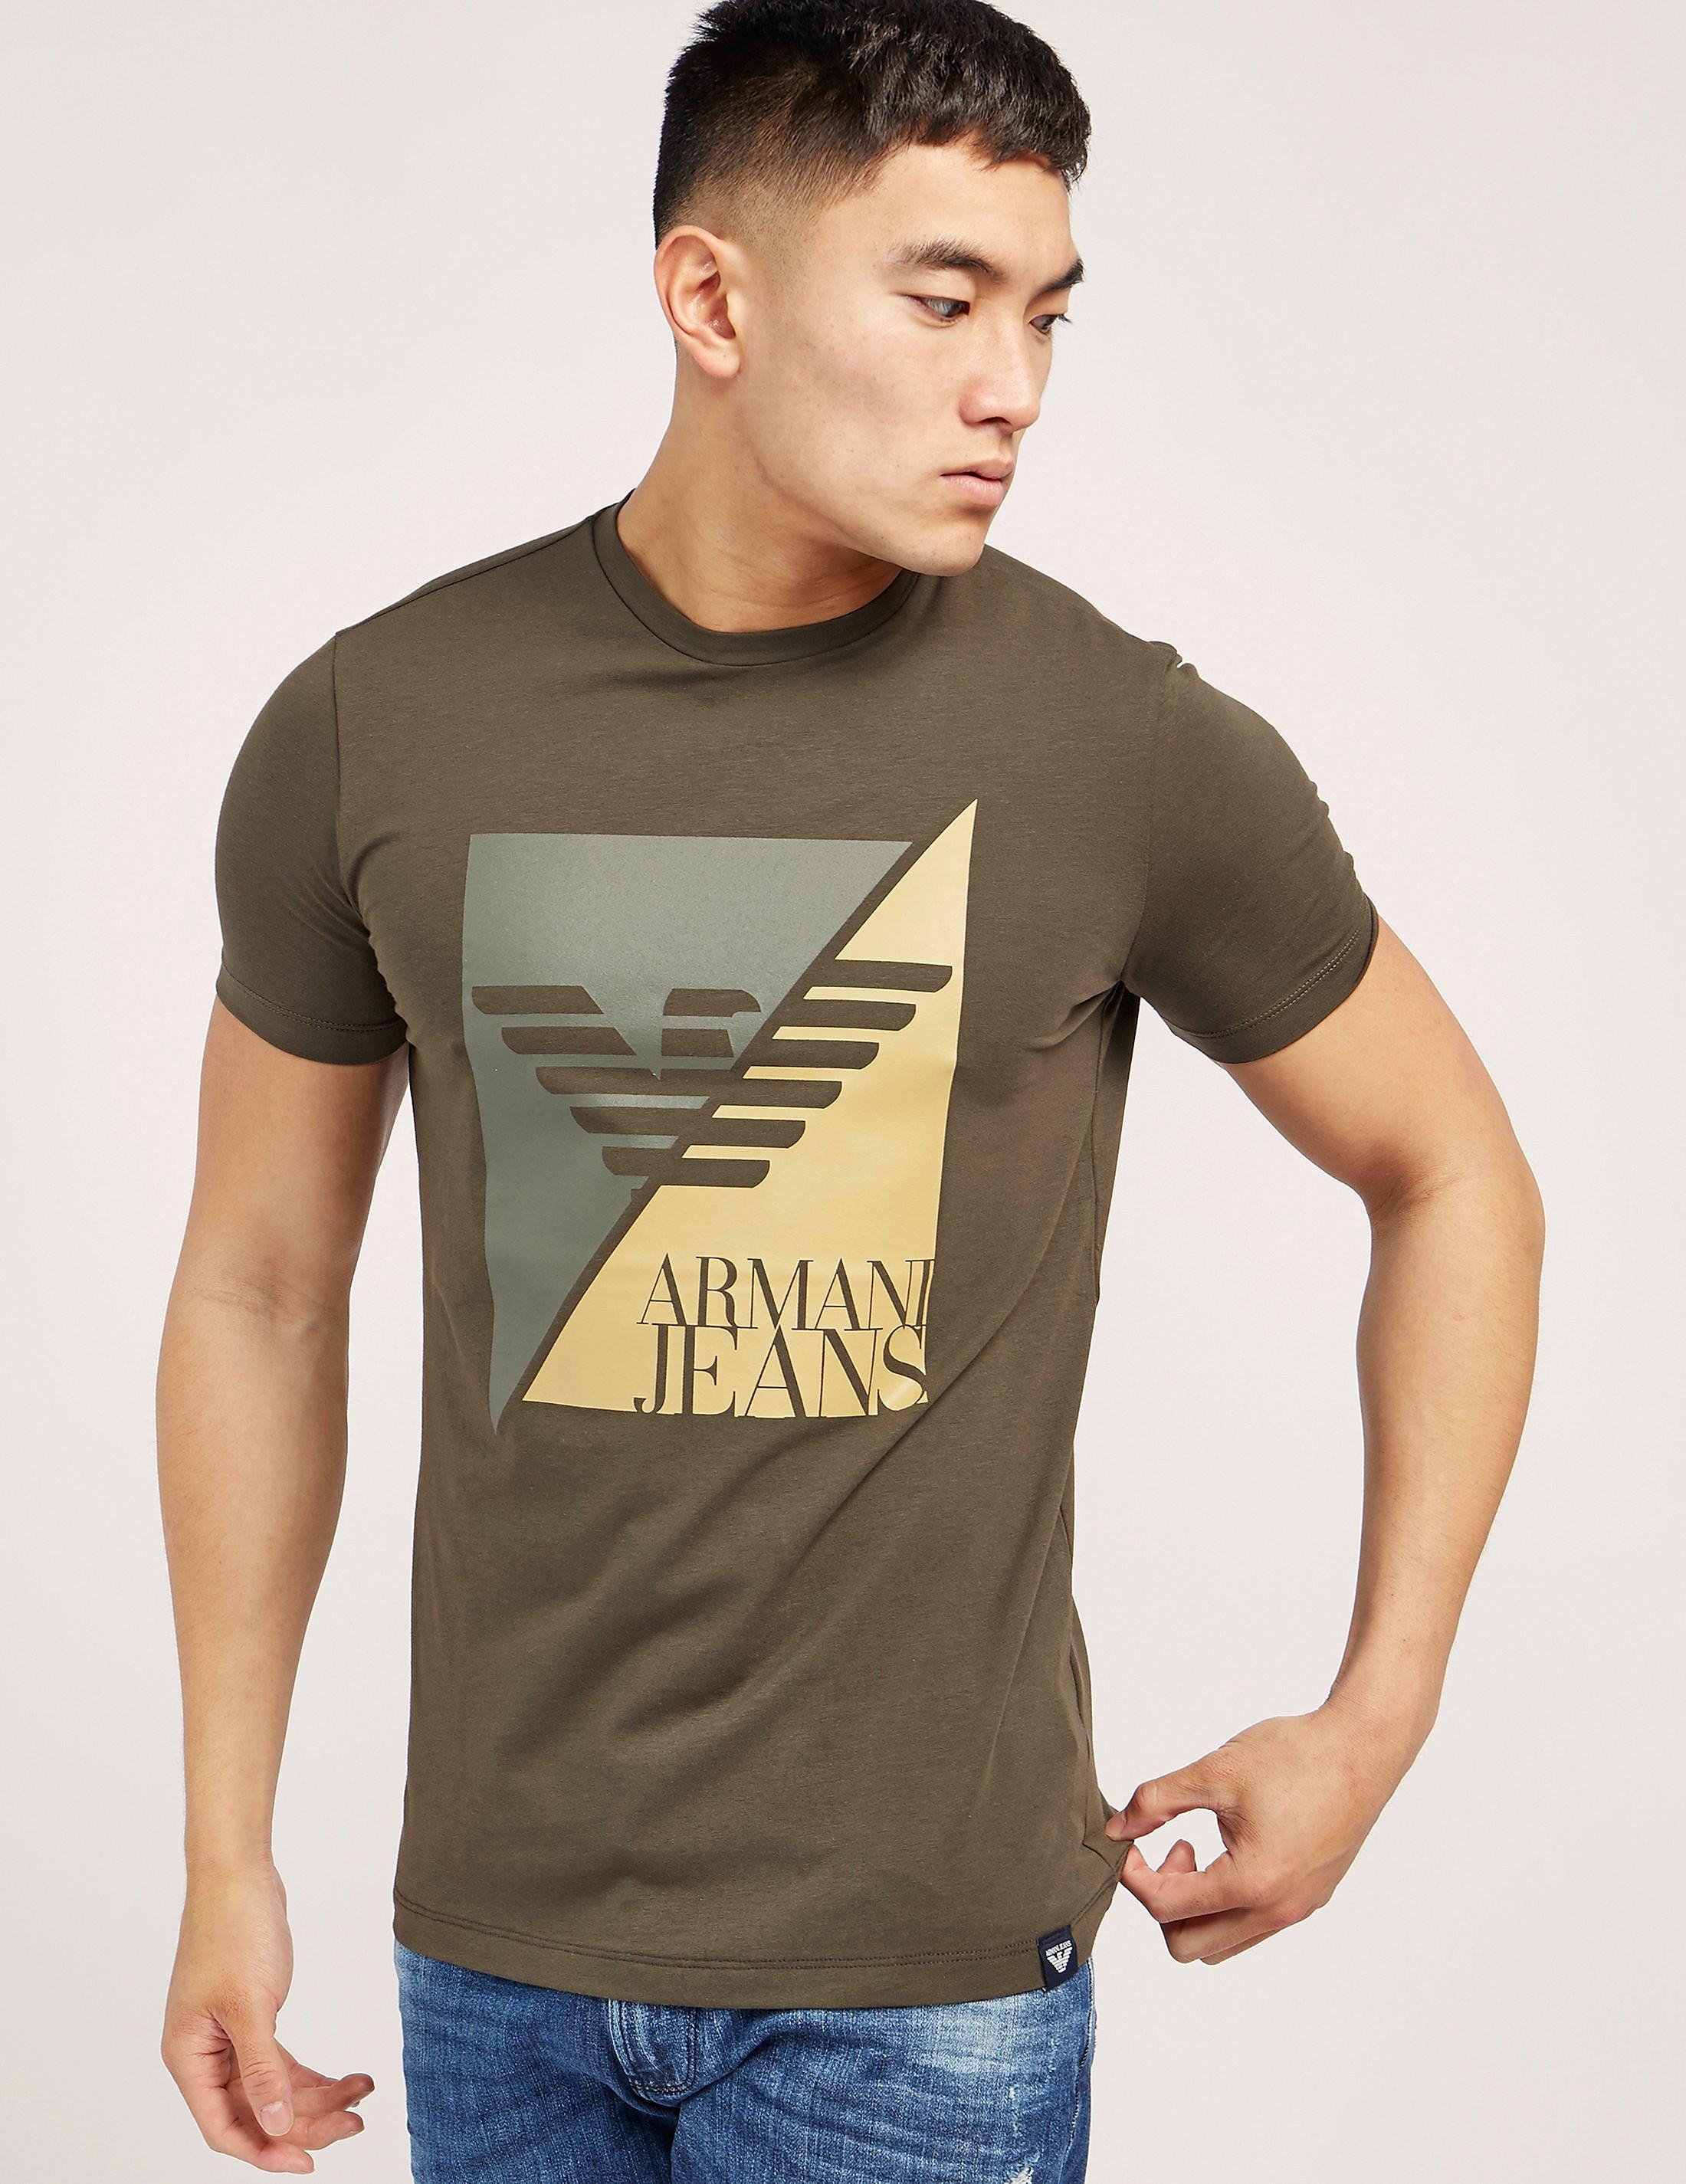 Armani Jeans Sliced Eagle Logo Short Sleeve T-Shirt